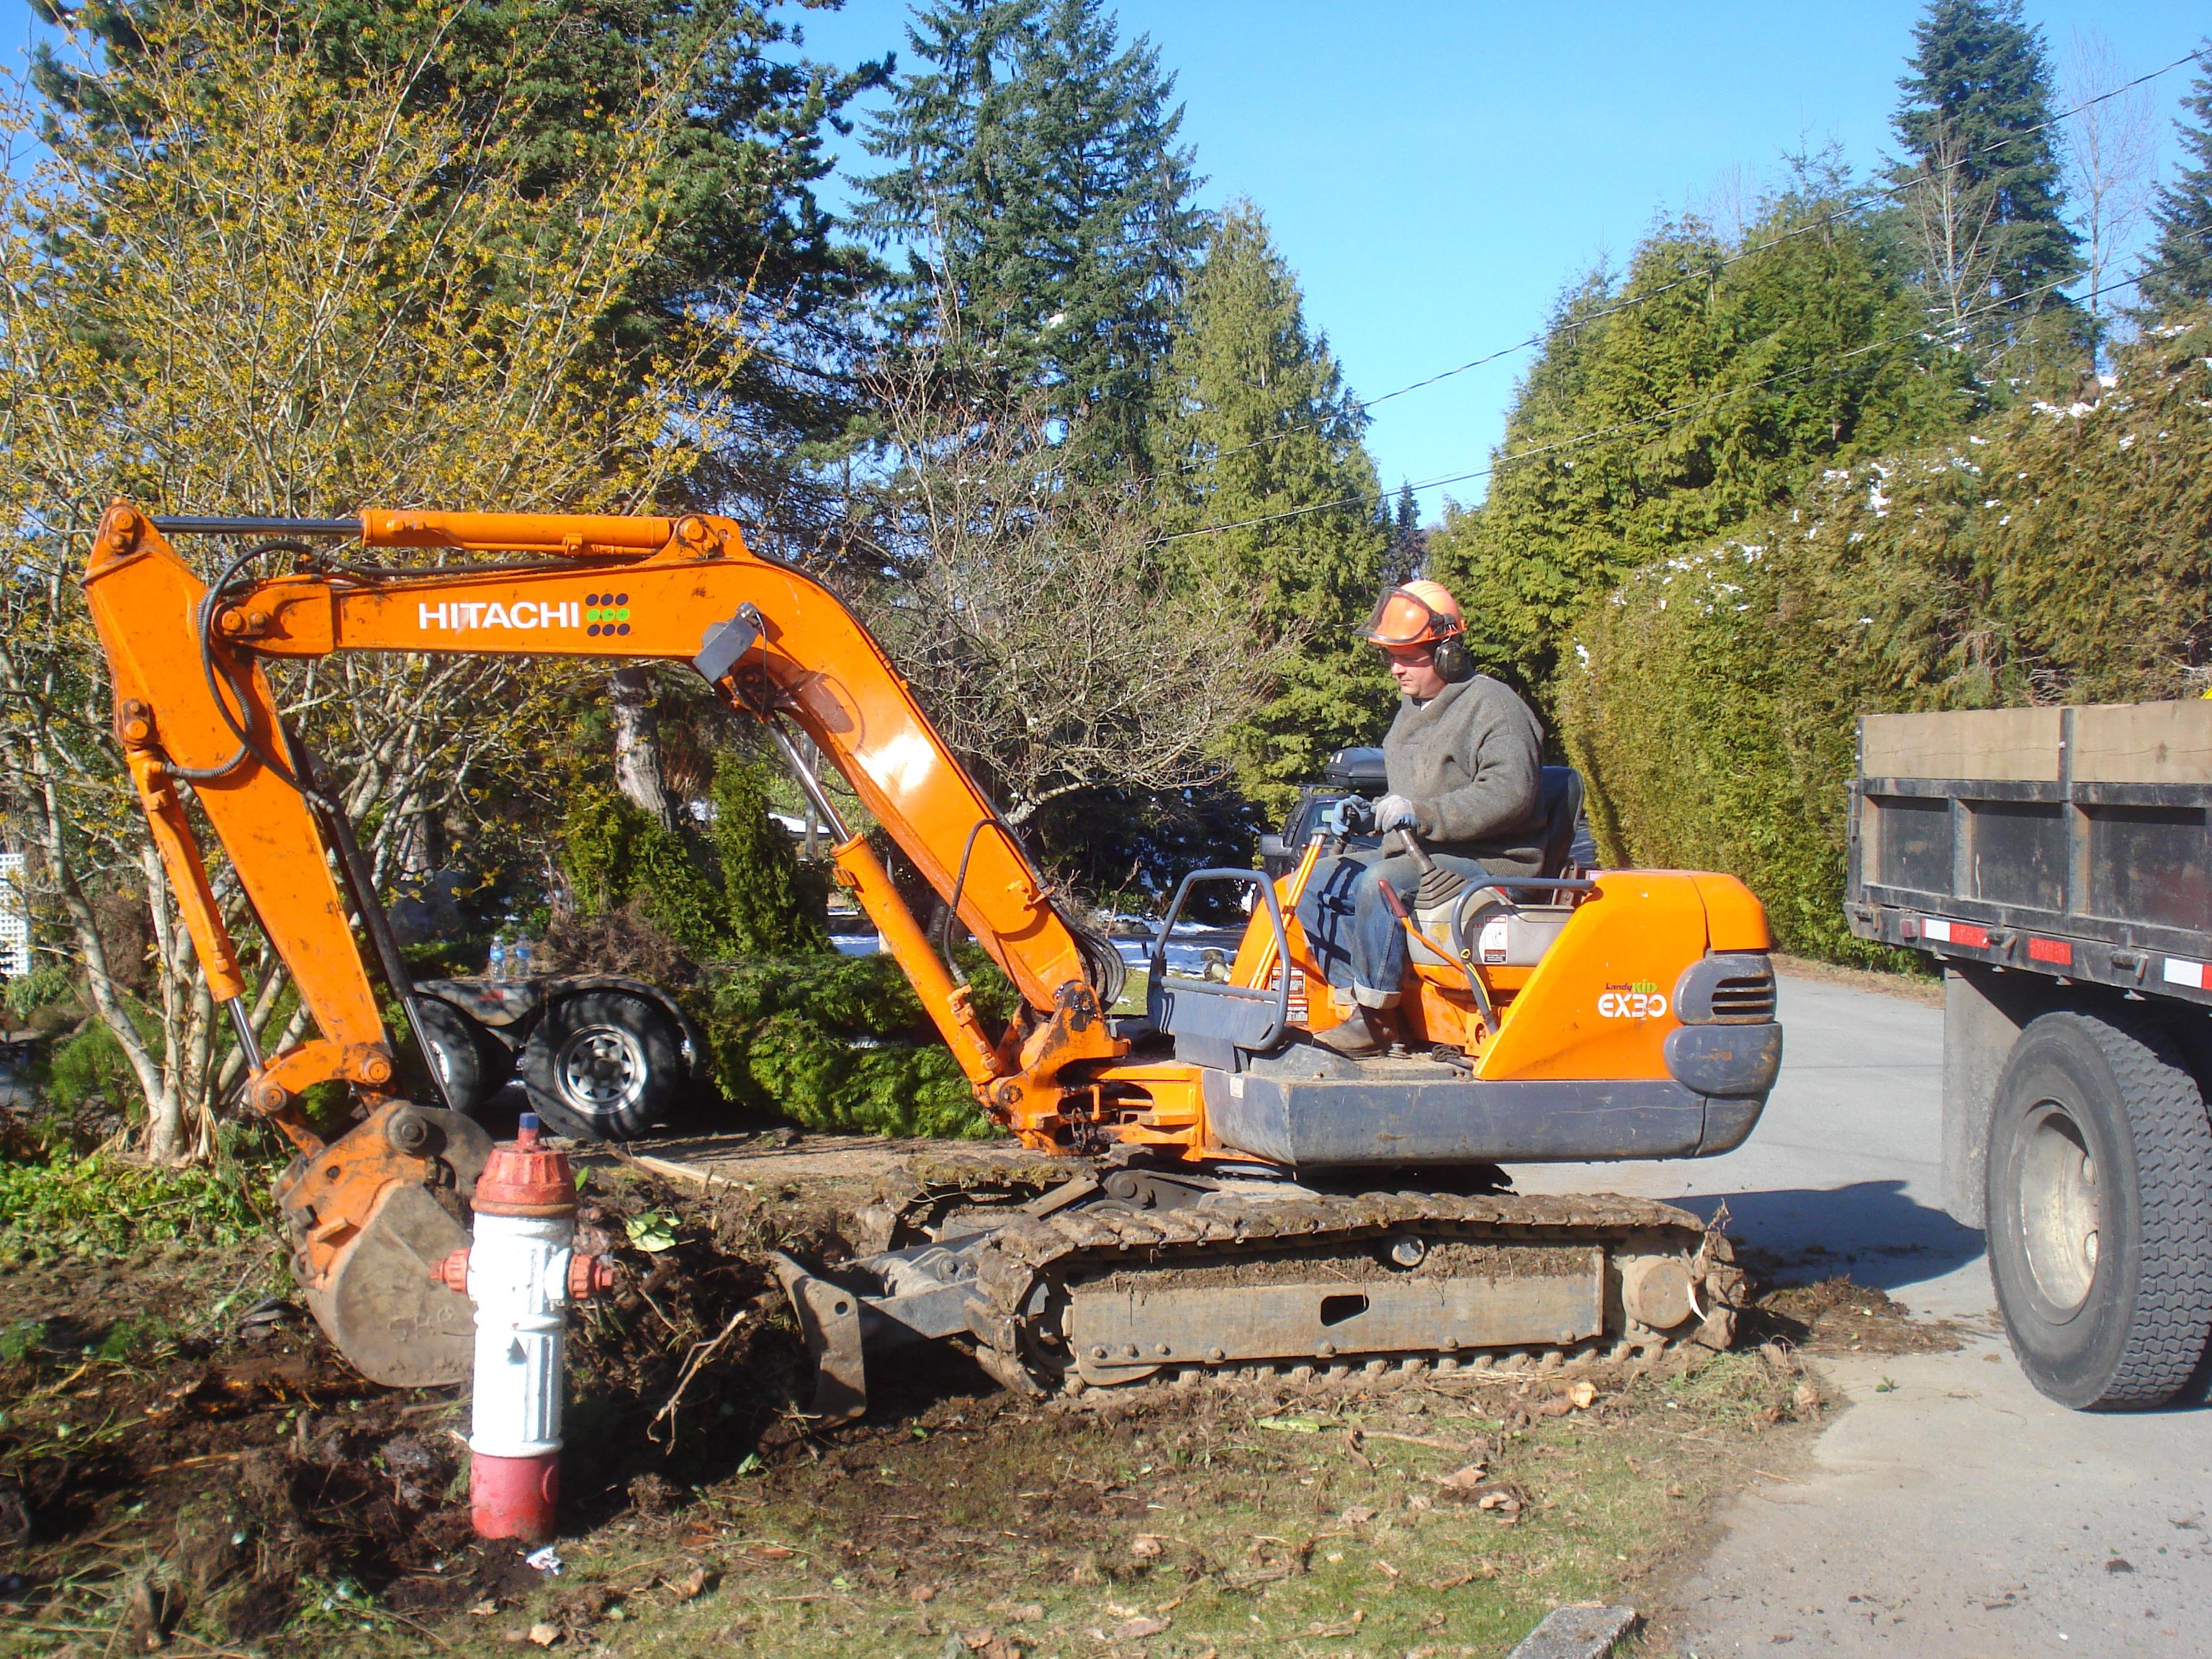 Srp Enterprises Weblog: Replacing Your Hedge To Reclaim Your Driveway